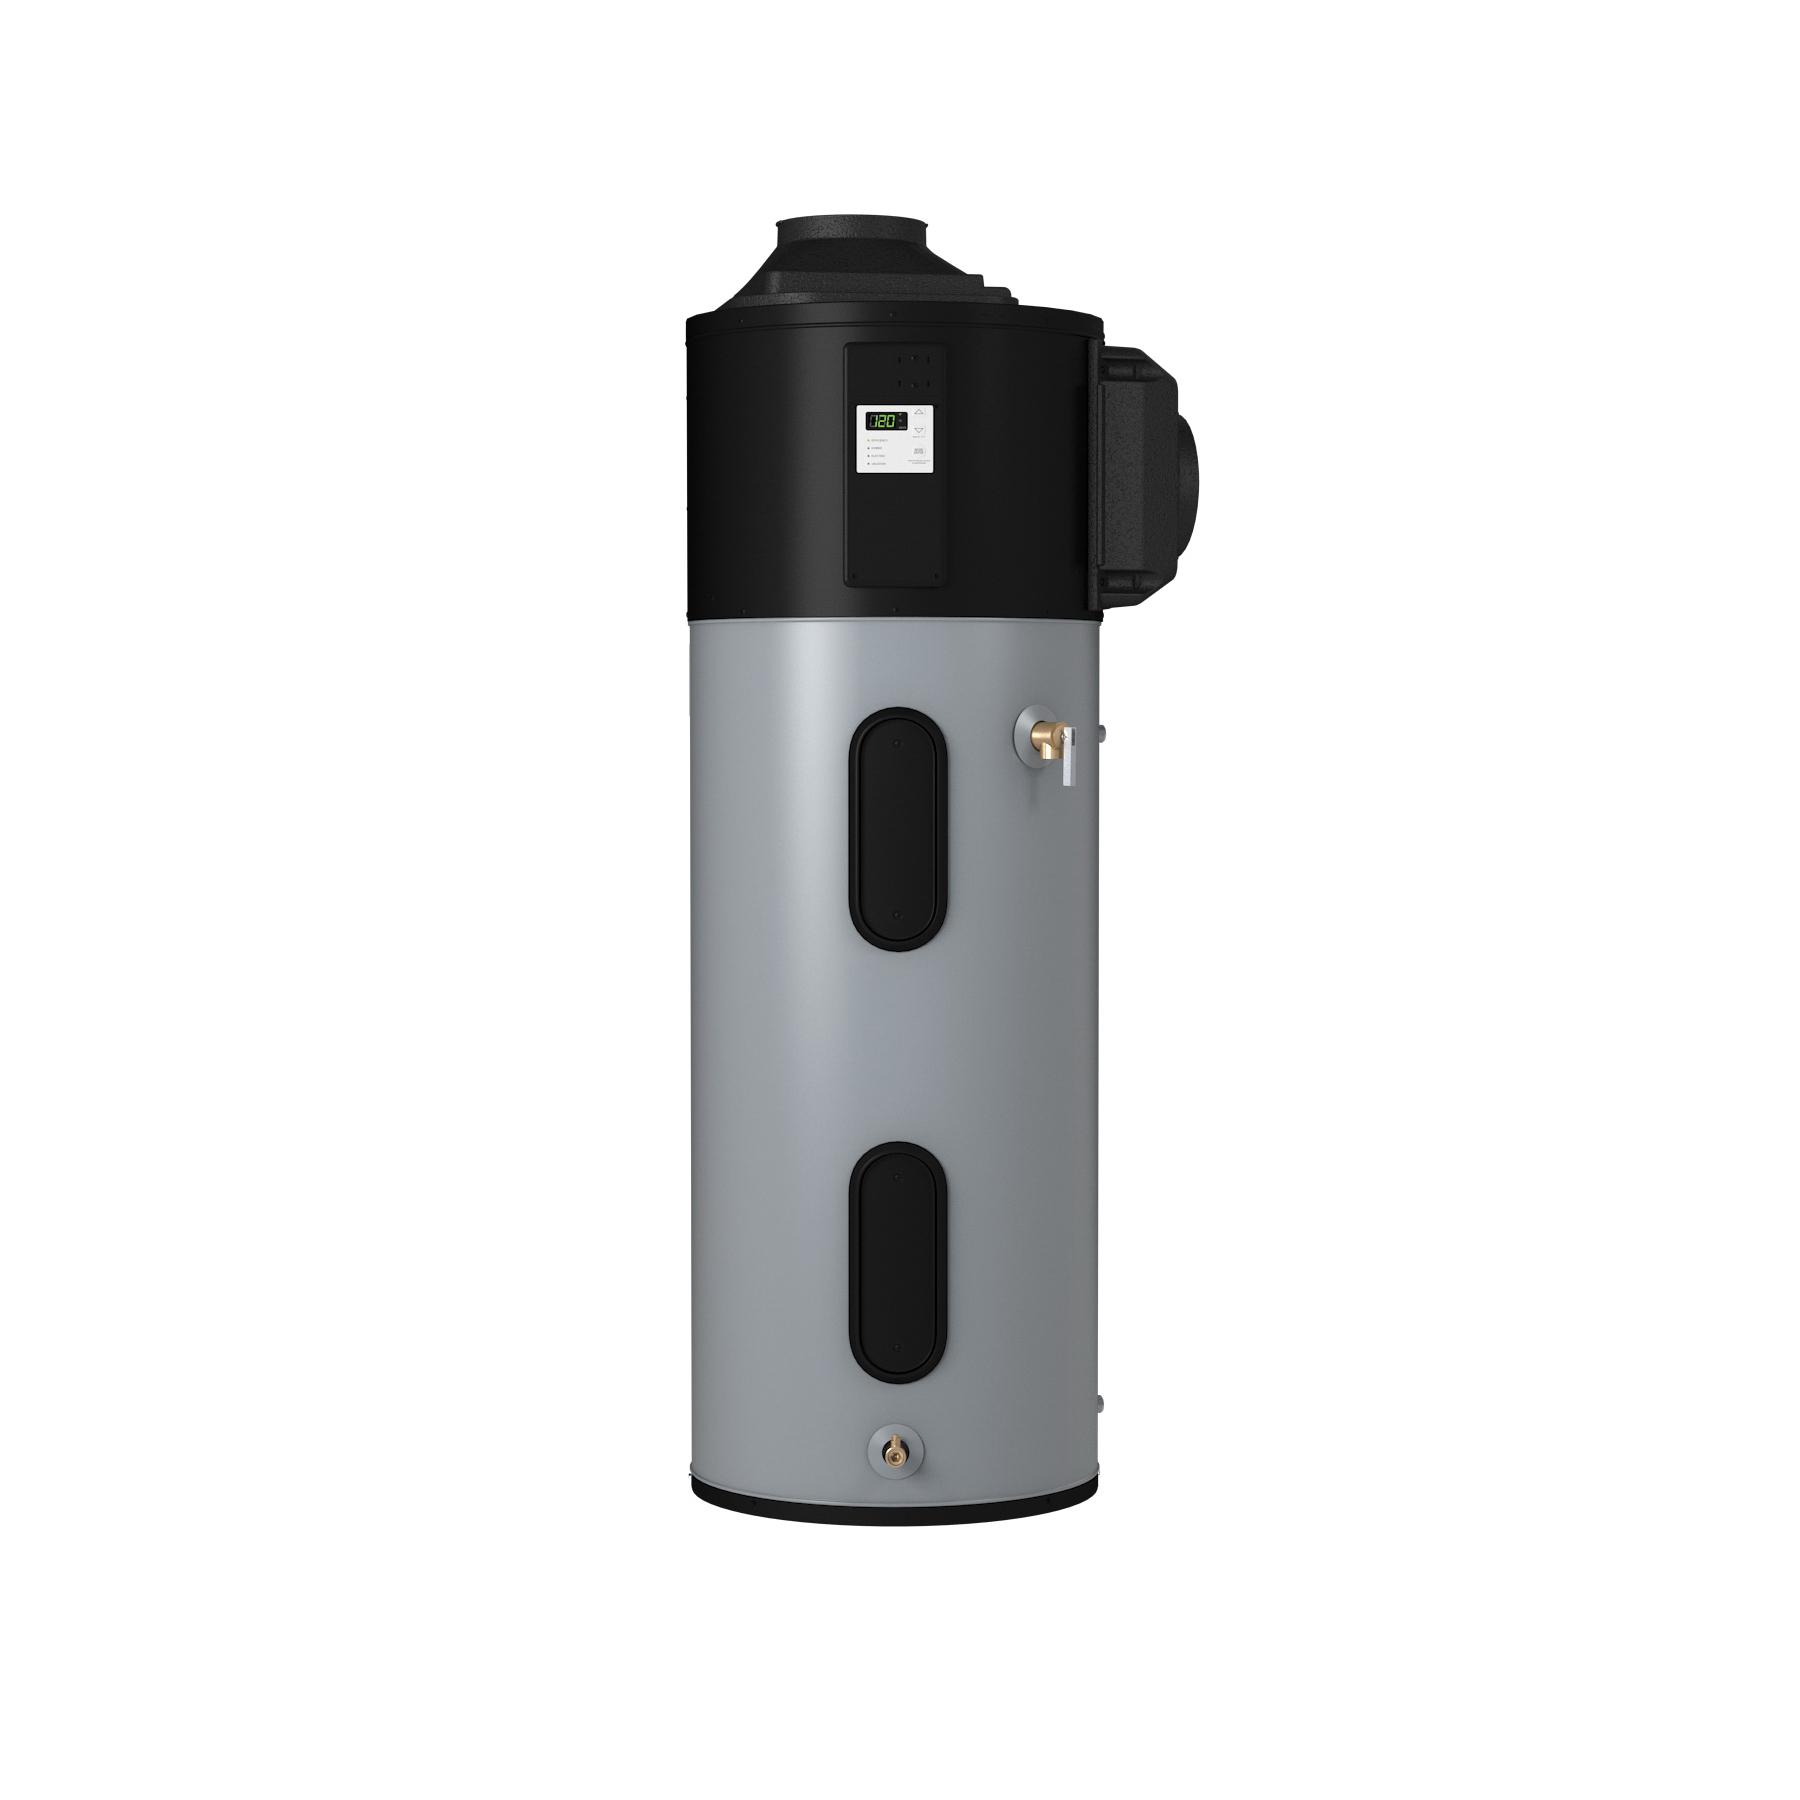 AO Smith® Voltex® 100234178 HPTU-50N Electric Water Heater, 50 gal Tank, 240 VAC, 9000 W, 1 ph, Tall or Short: Tall